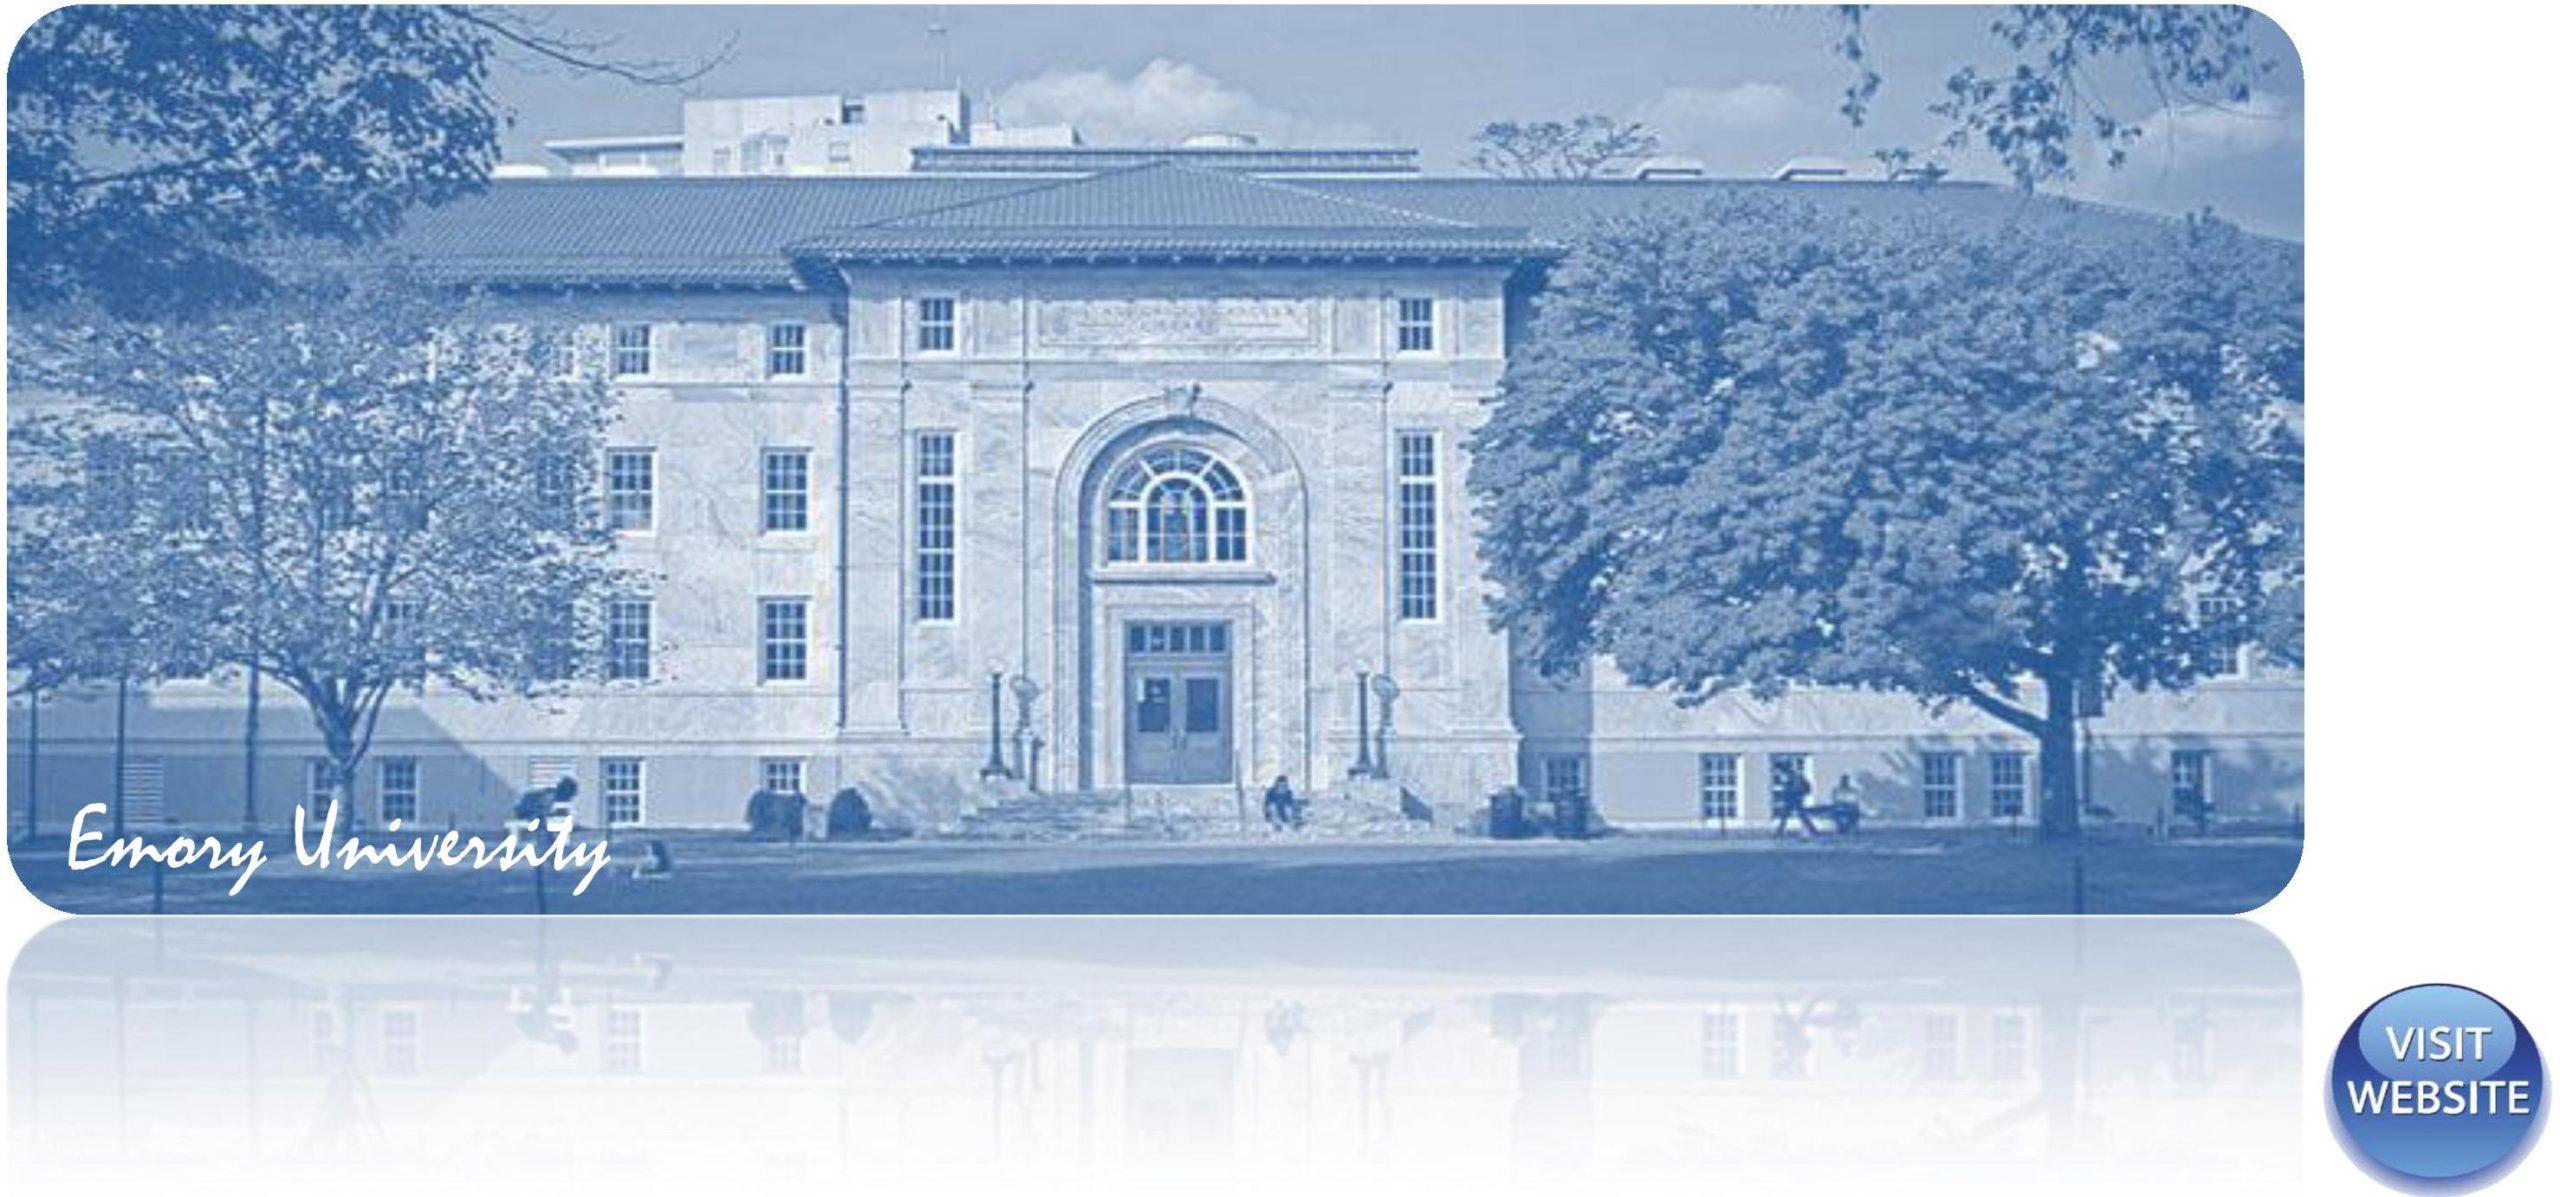 Emory University USA